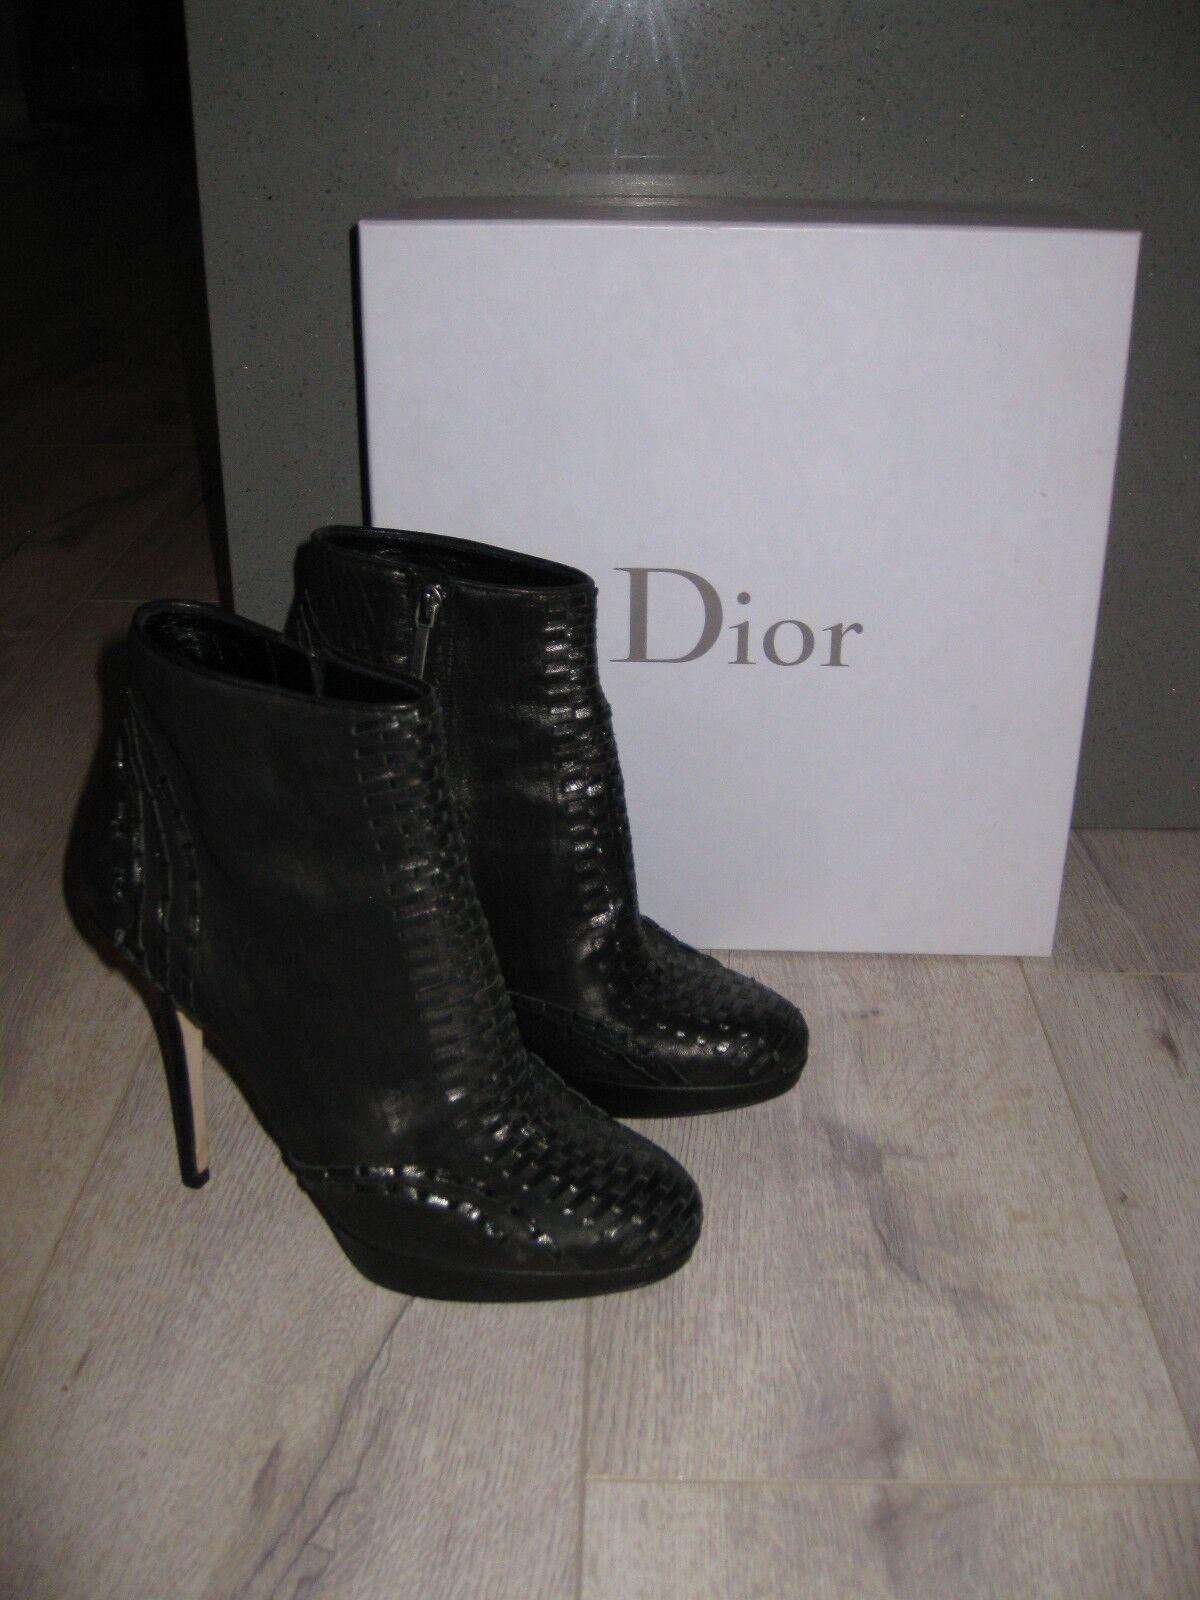 EUC EUC EUC  Gorgeous  Christian Dior Miss Dior Black Leather Platform Booties Boots 9.5 92f745